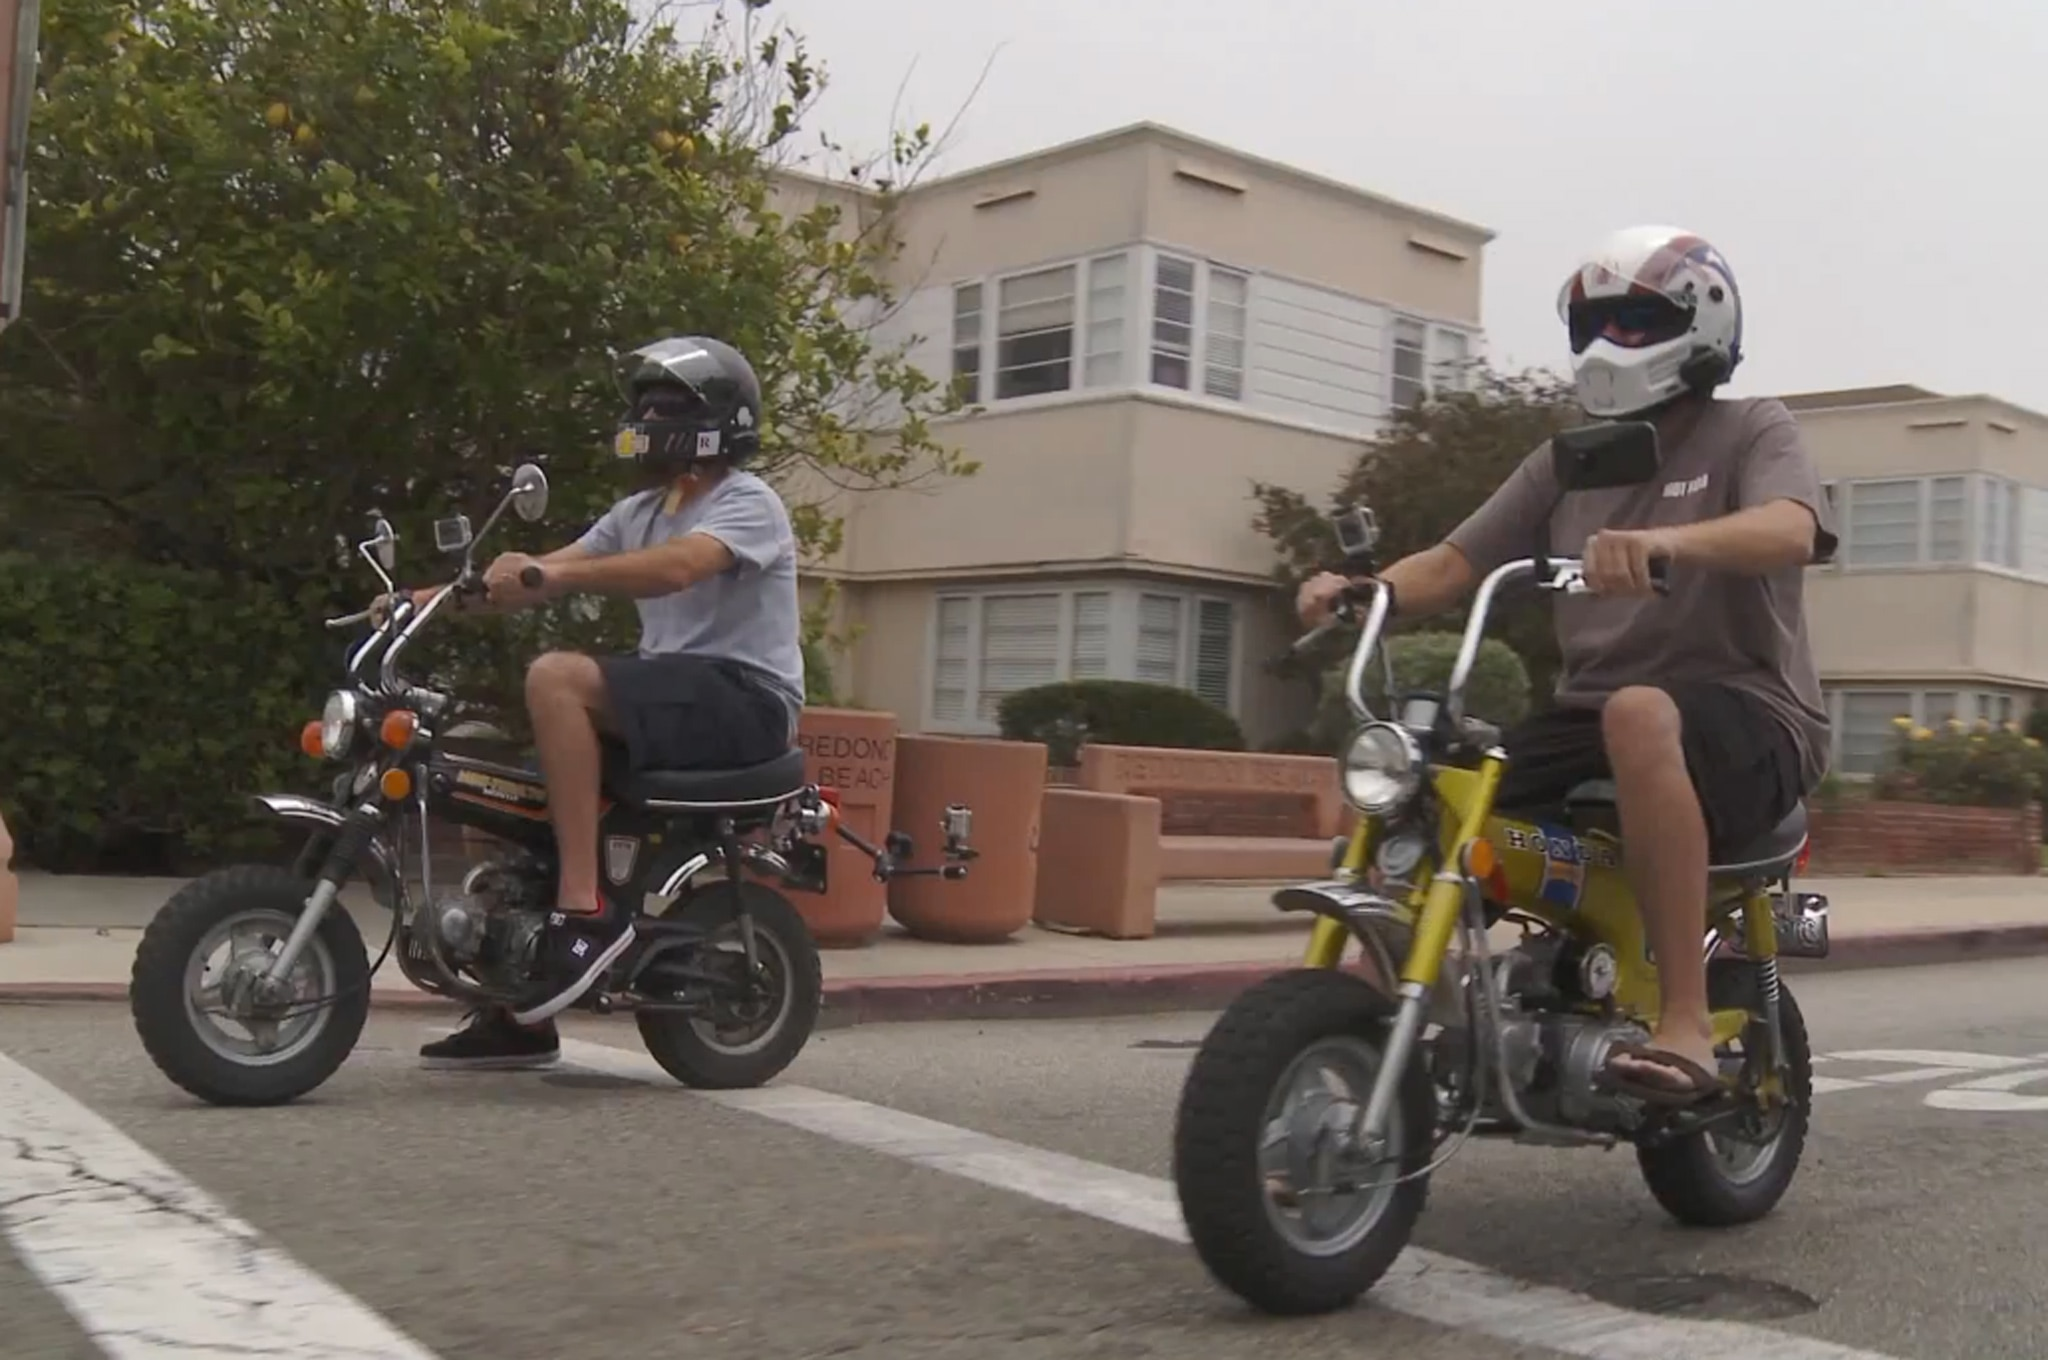 Hot Rod Editors On Honda Mini Bikes Screen Grab1